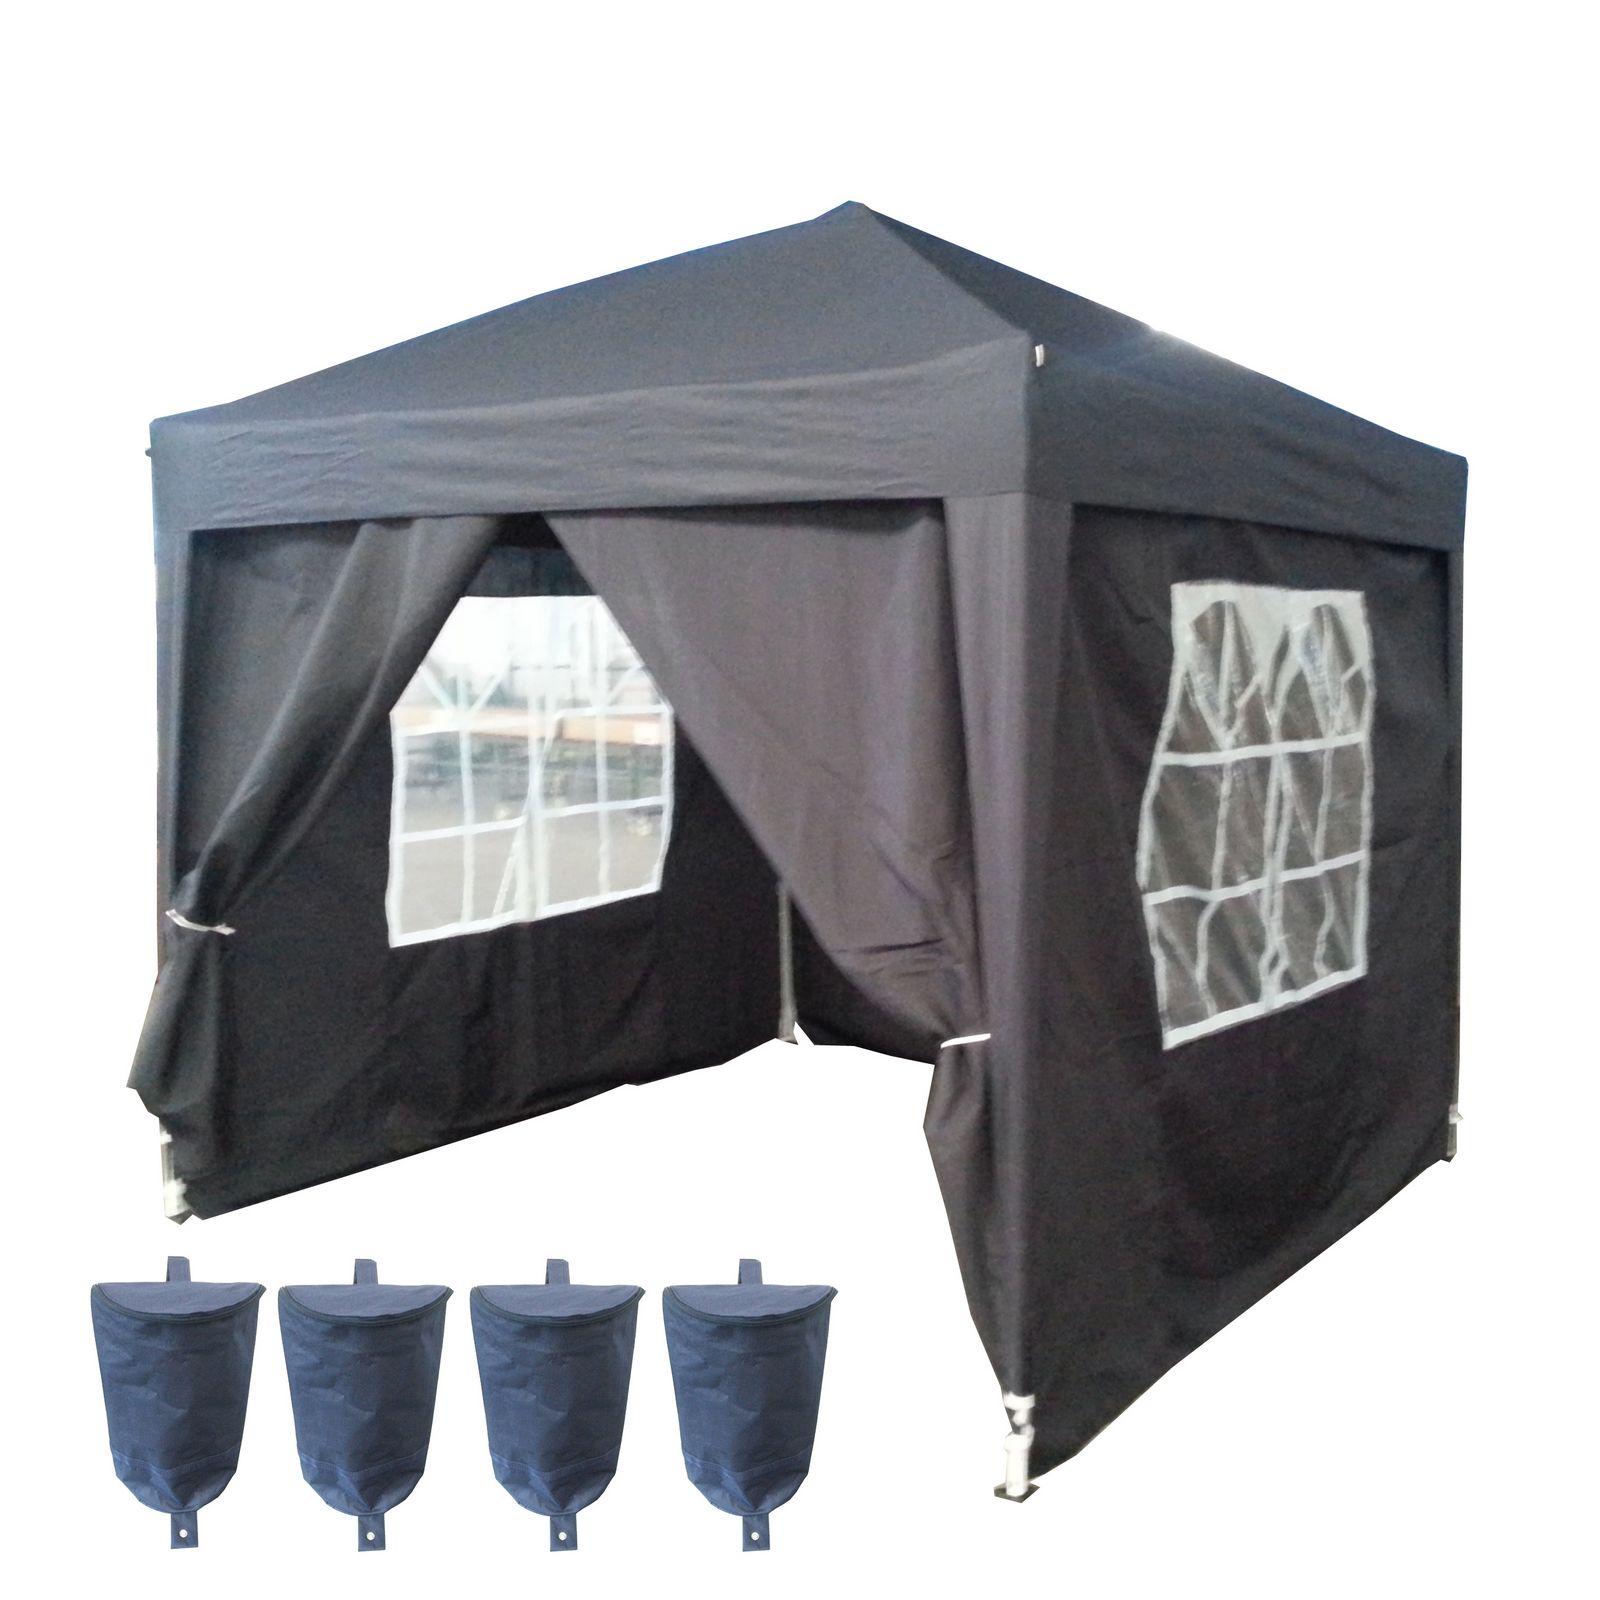 erscheinen gartenlaube wasserfest 2 5 x faltbar zelt. Black Bedroom Furniture Sets. Home Design Ideas